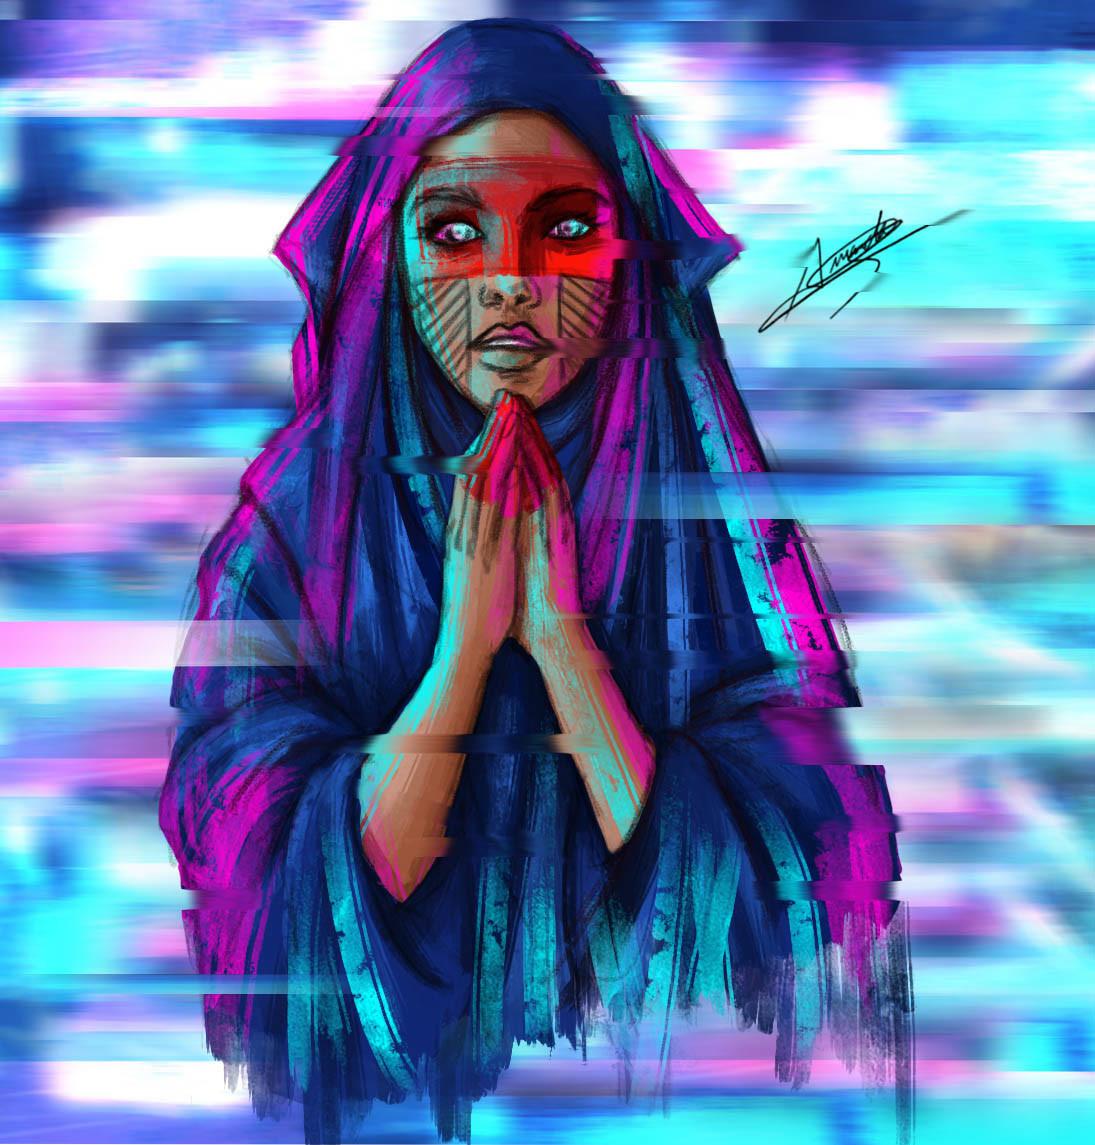 Amanda Shell artstation - mahawar - ghost in the shell, amanda ferrer